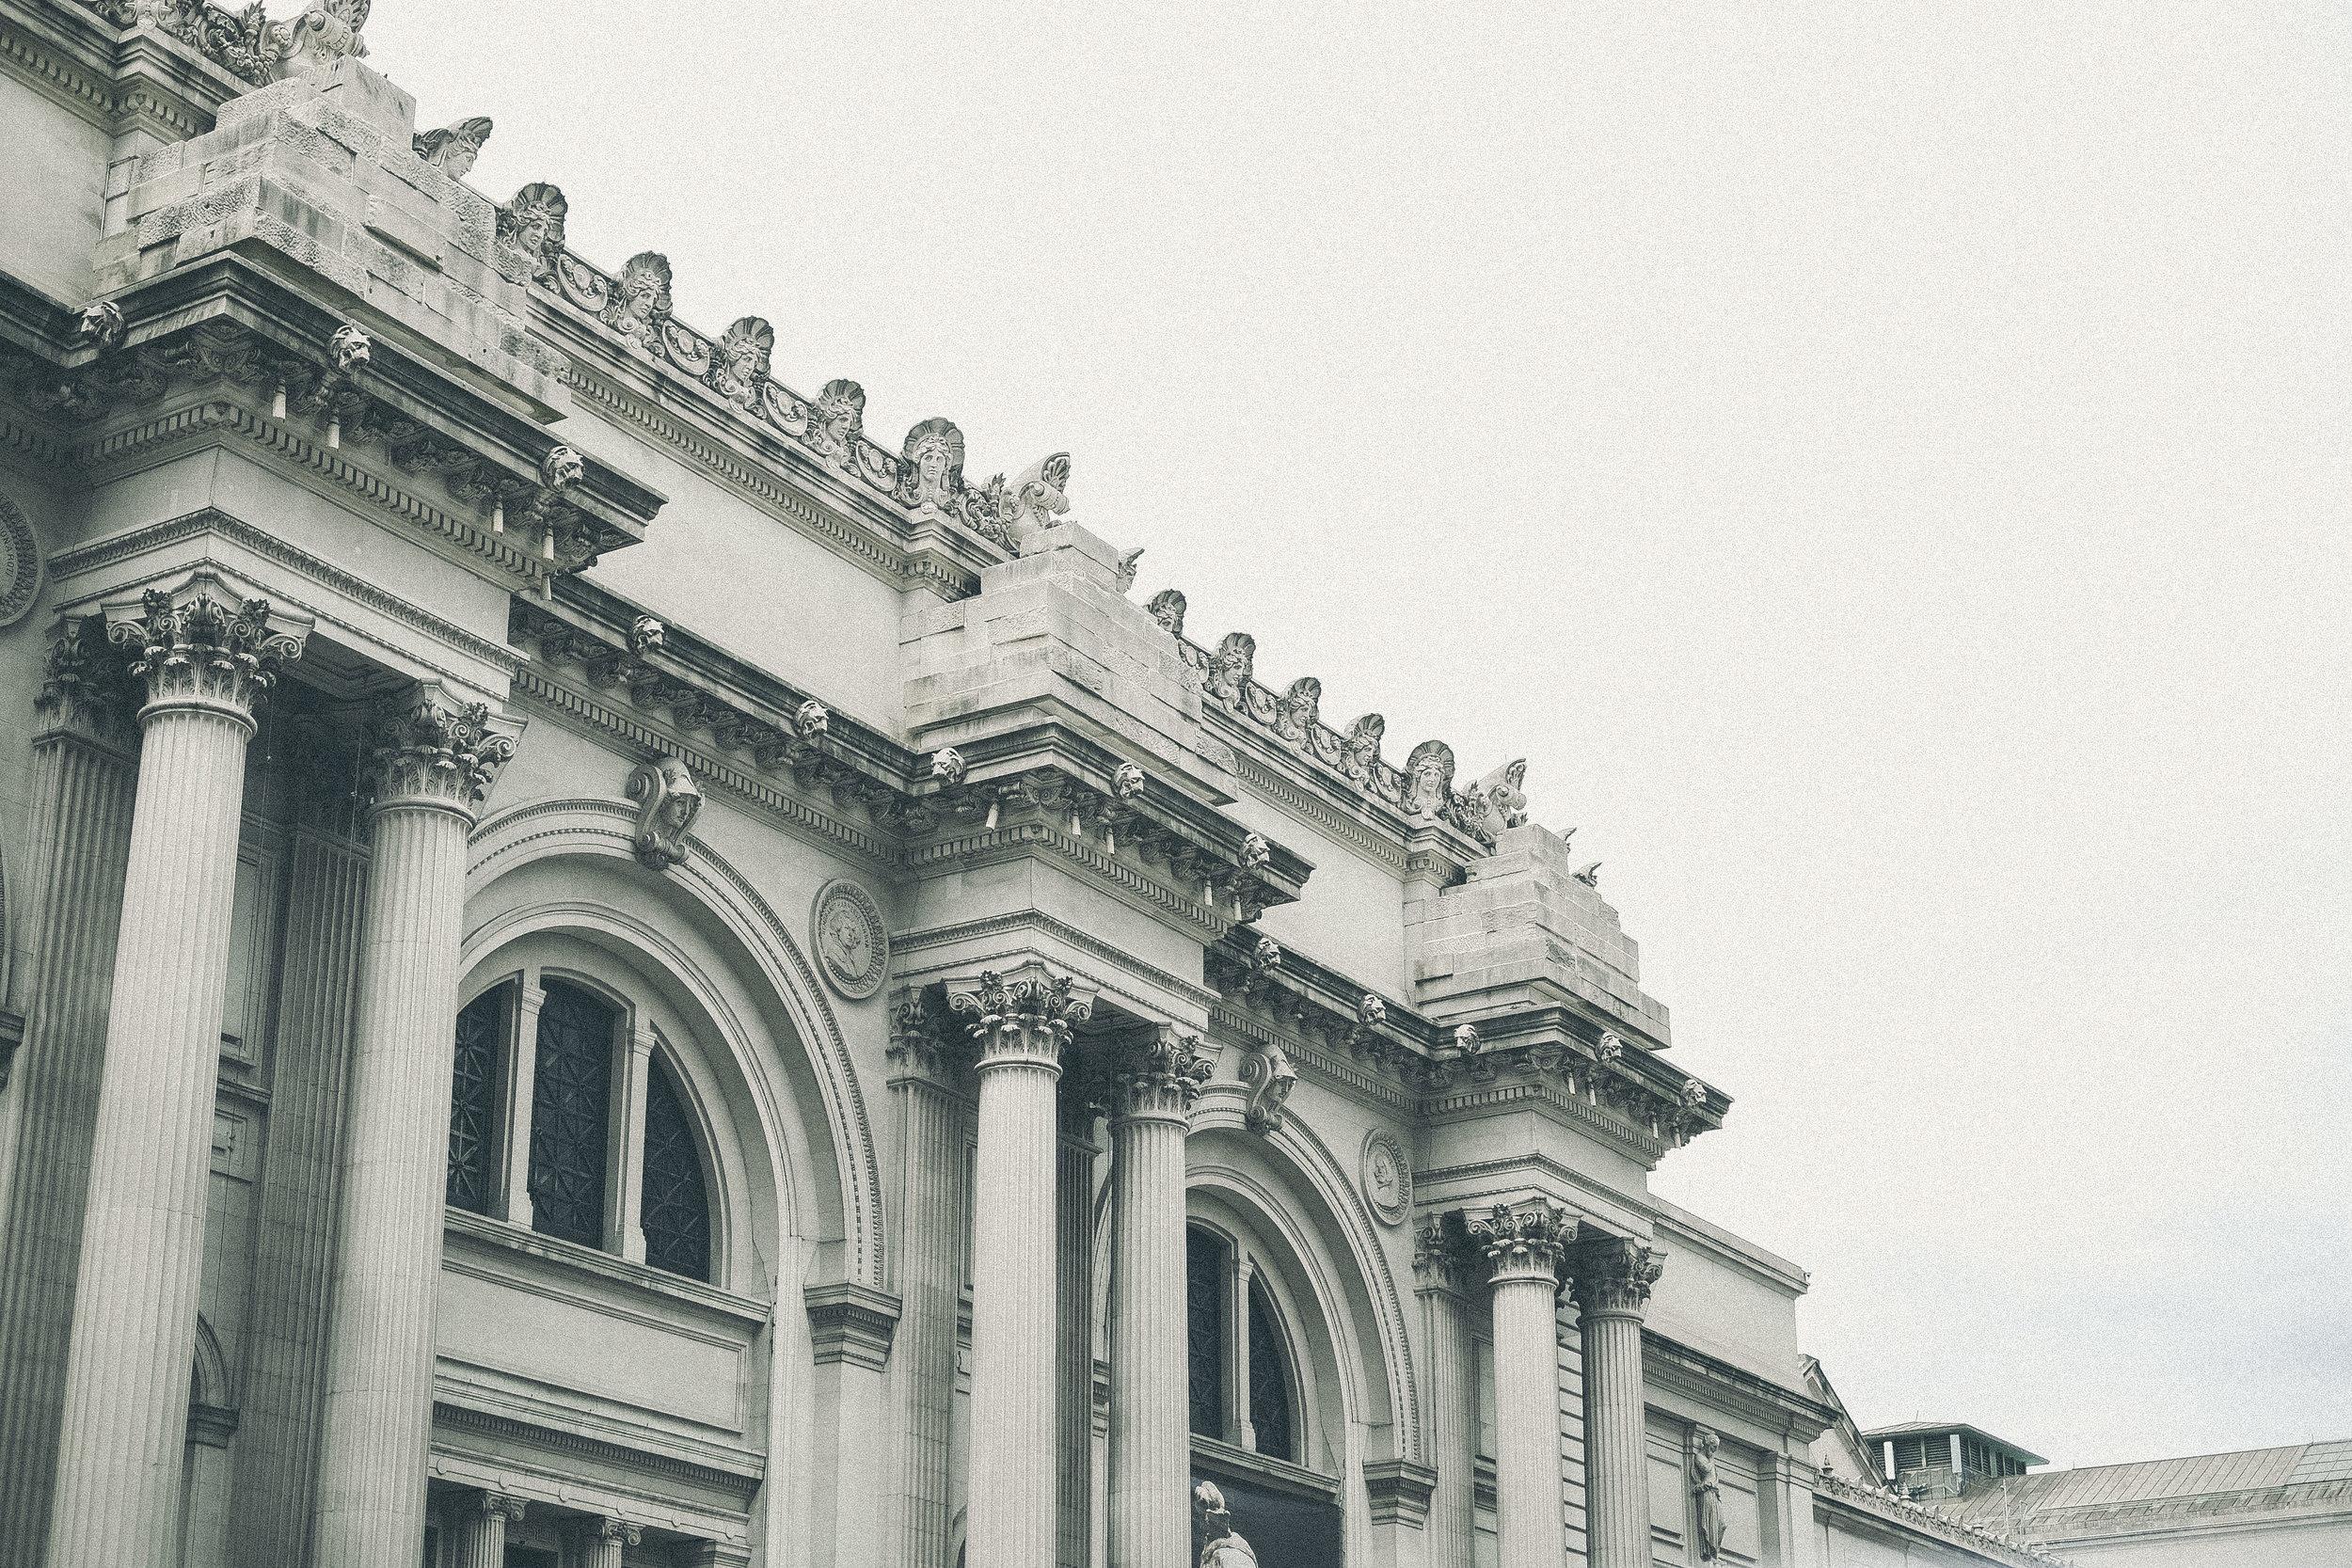 dérrive travel - the met museum and balthazar, nyc www.derrive.com #themetmuseum #nyc #newyork #balthazar #traveldiary